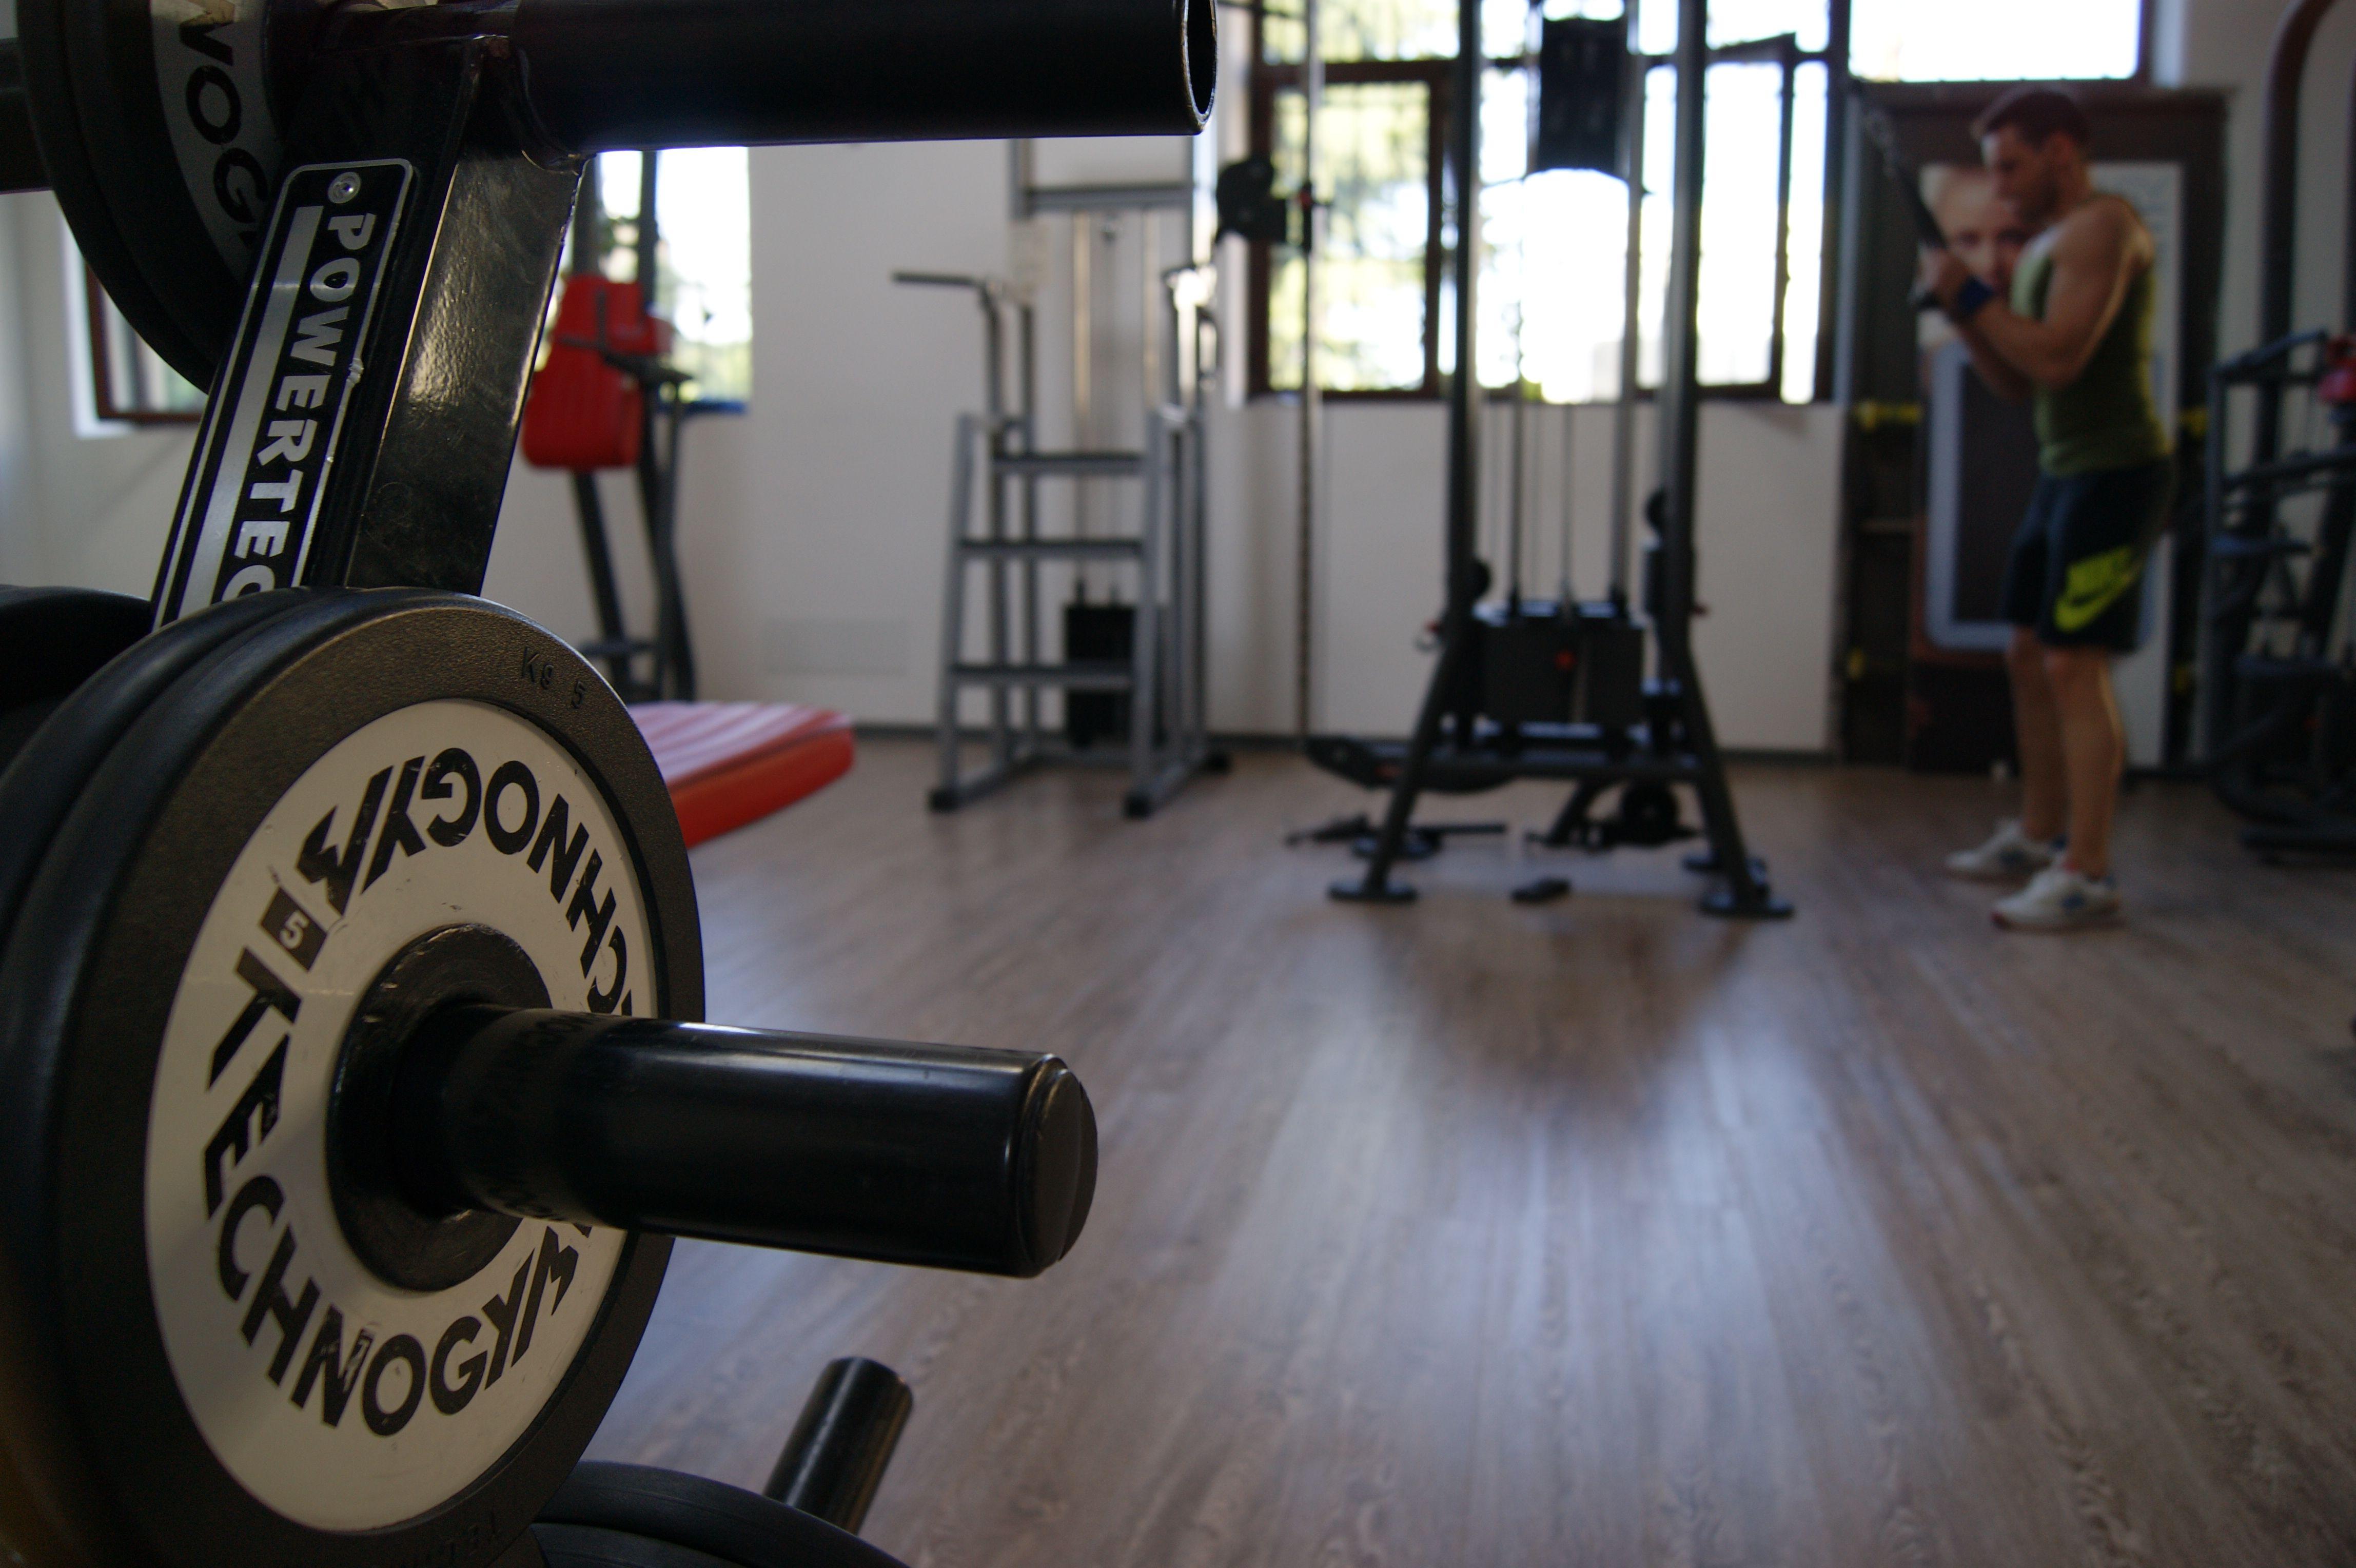 Cose Di Casa Carate pesi technogym palestra easy life fitness di carate b.za